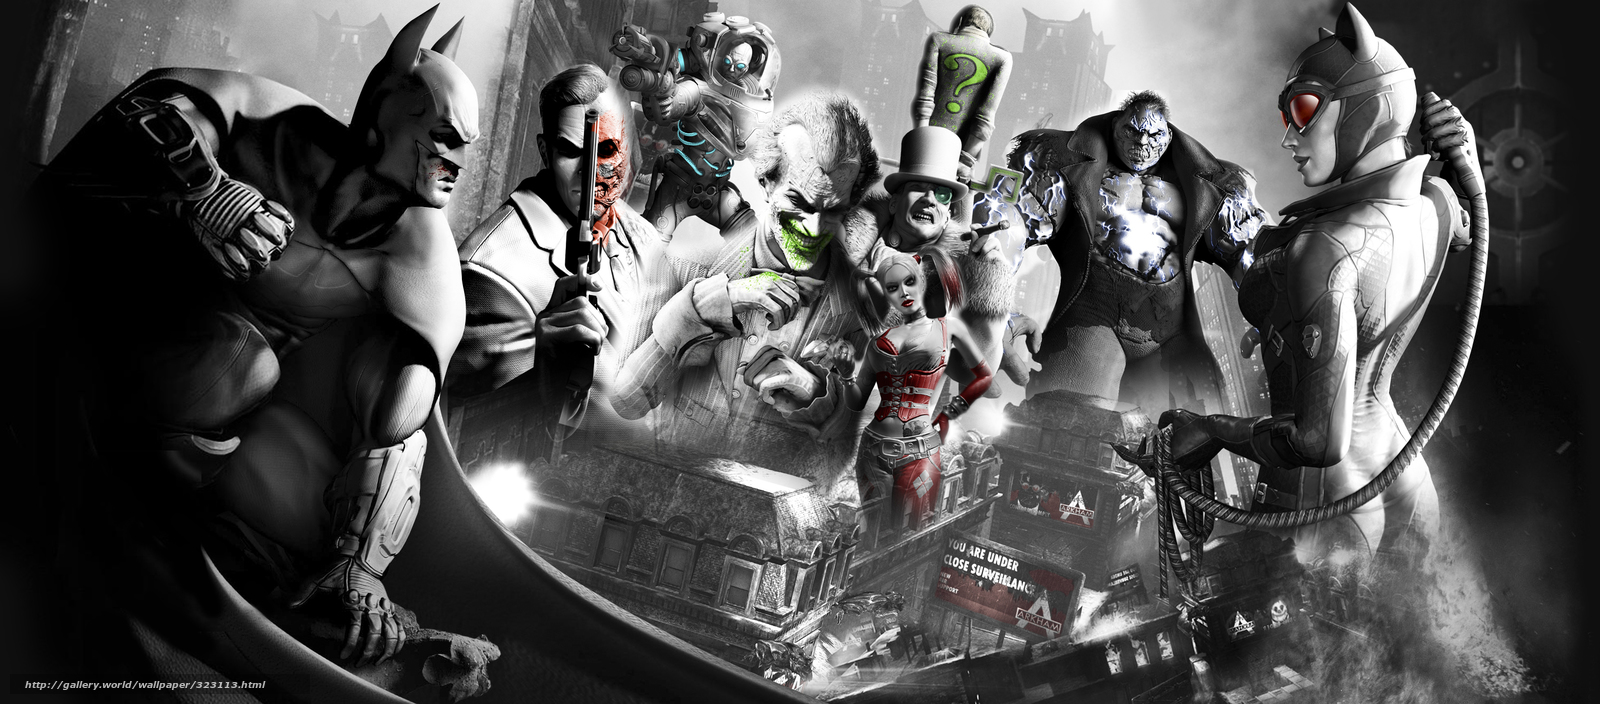 Download wallpaper batman arkham city batman Catwoman catwoman 1600x704